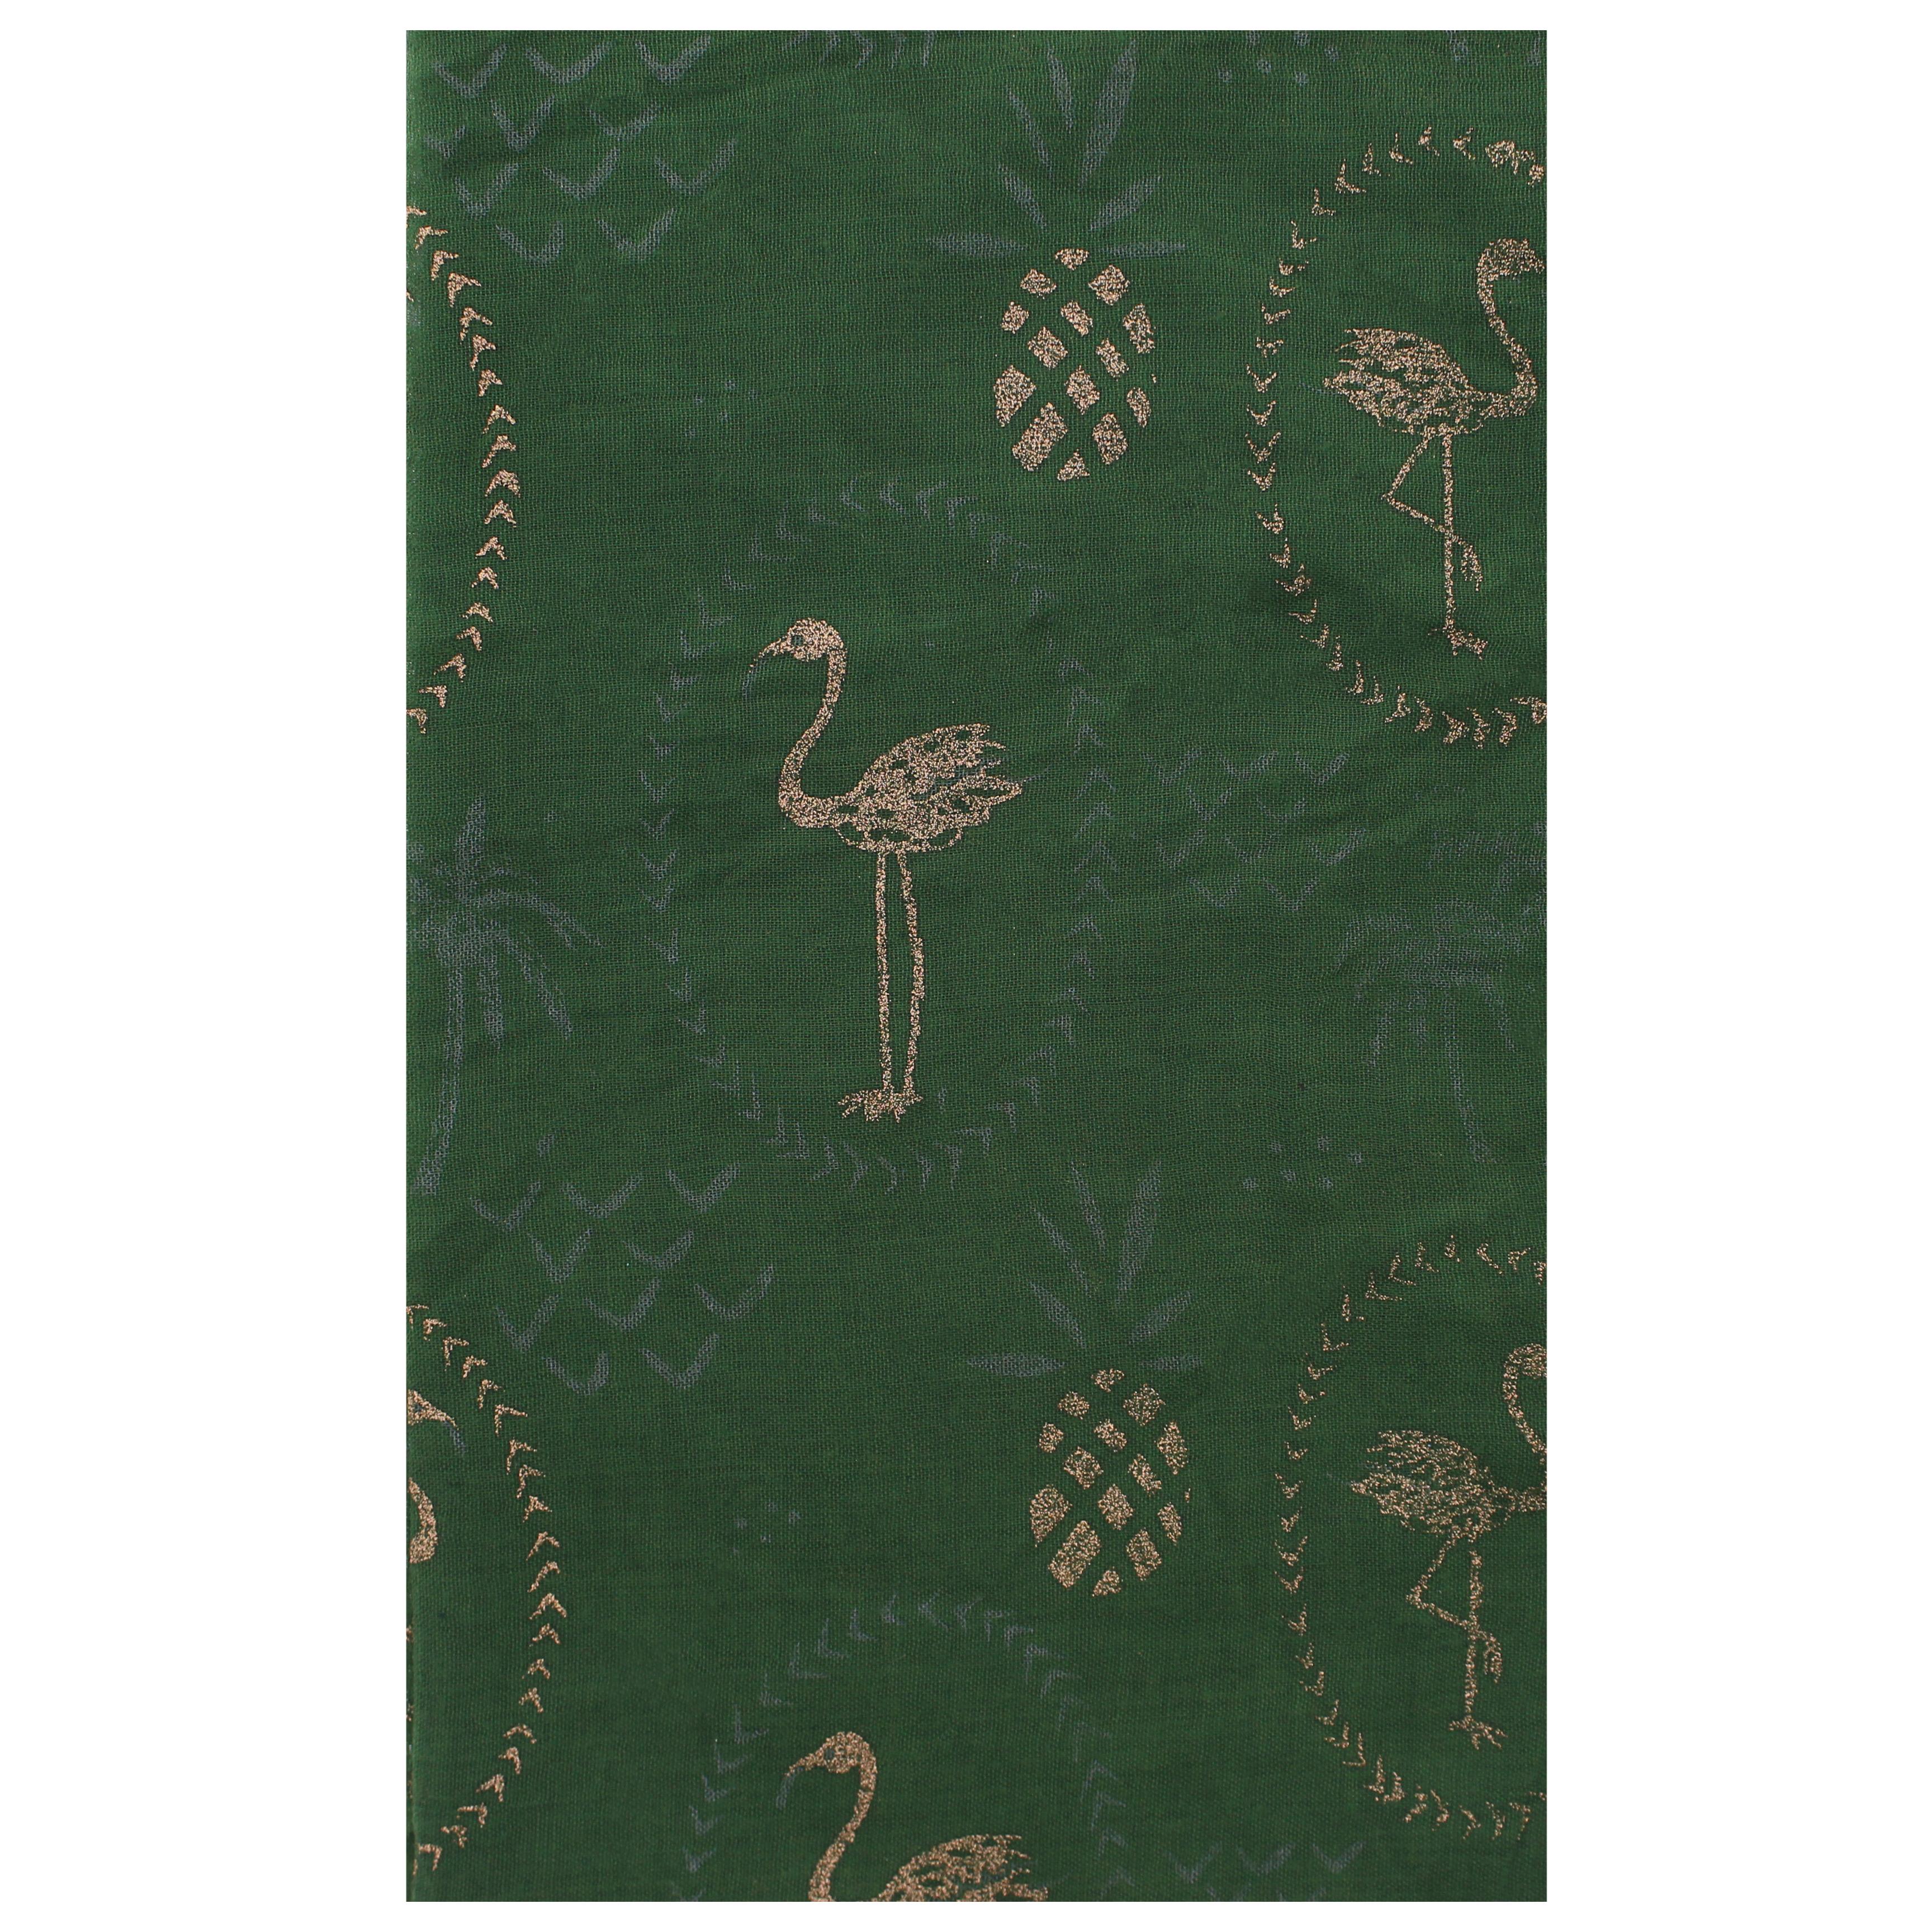 Women Ladies Scarf with Gold Glitter Flamingo /& Pineapple Print